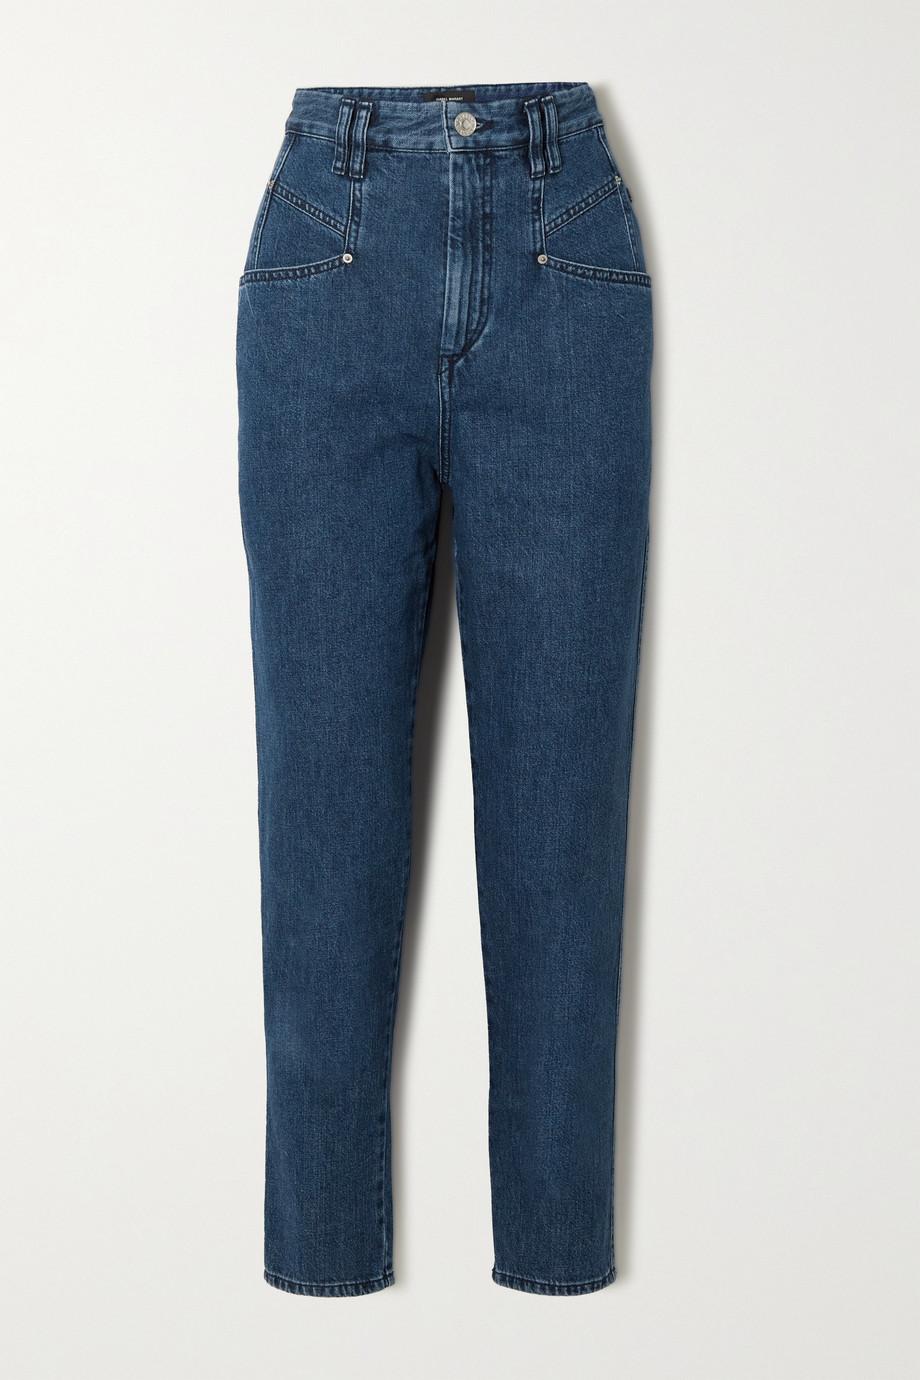 Isabel Marant Dipadela high-rise tapered jeans